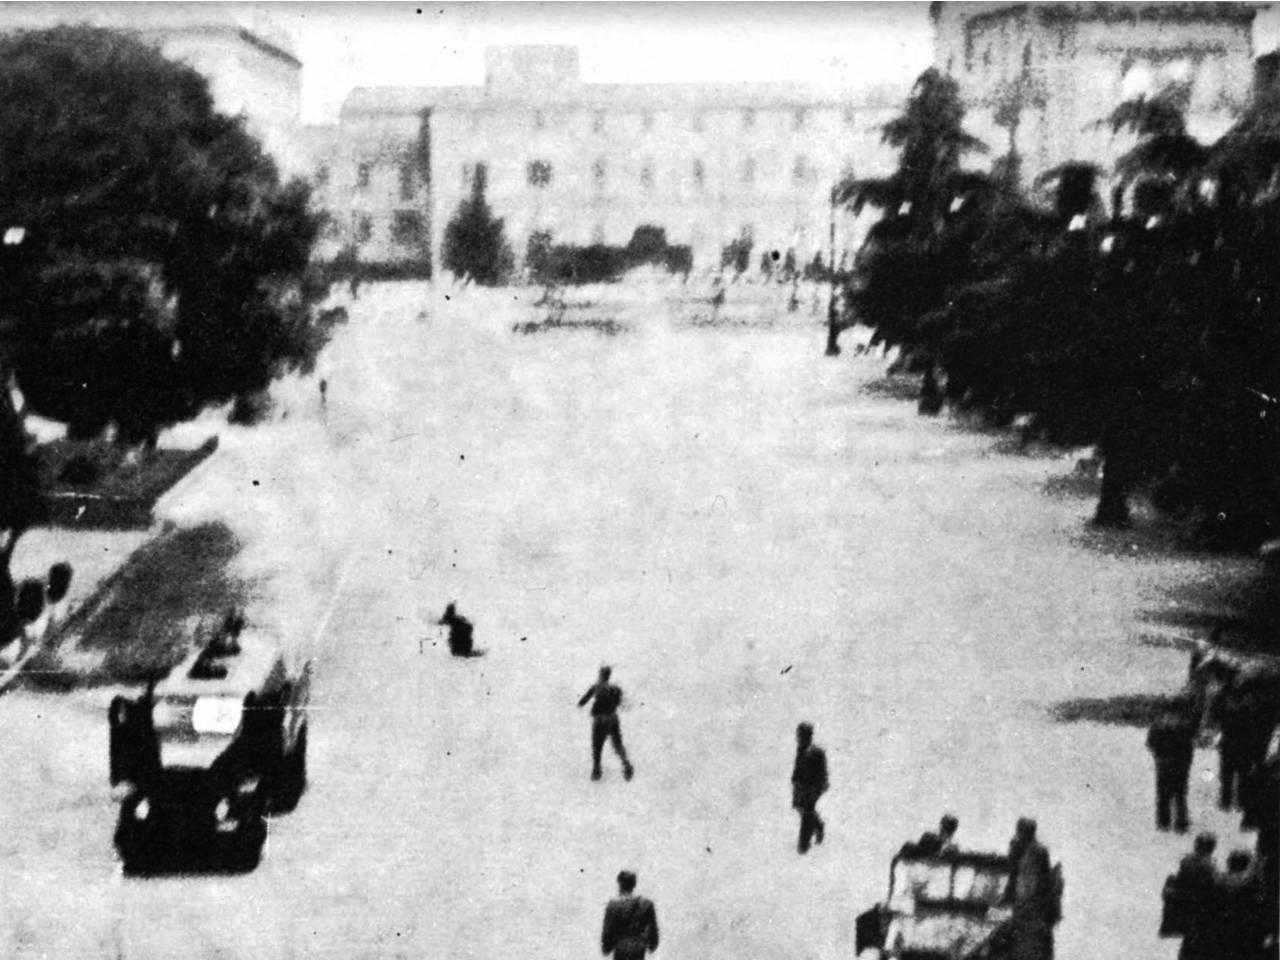 7 luglio 60 spari piazza